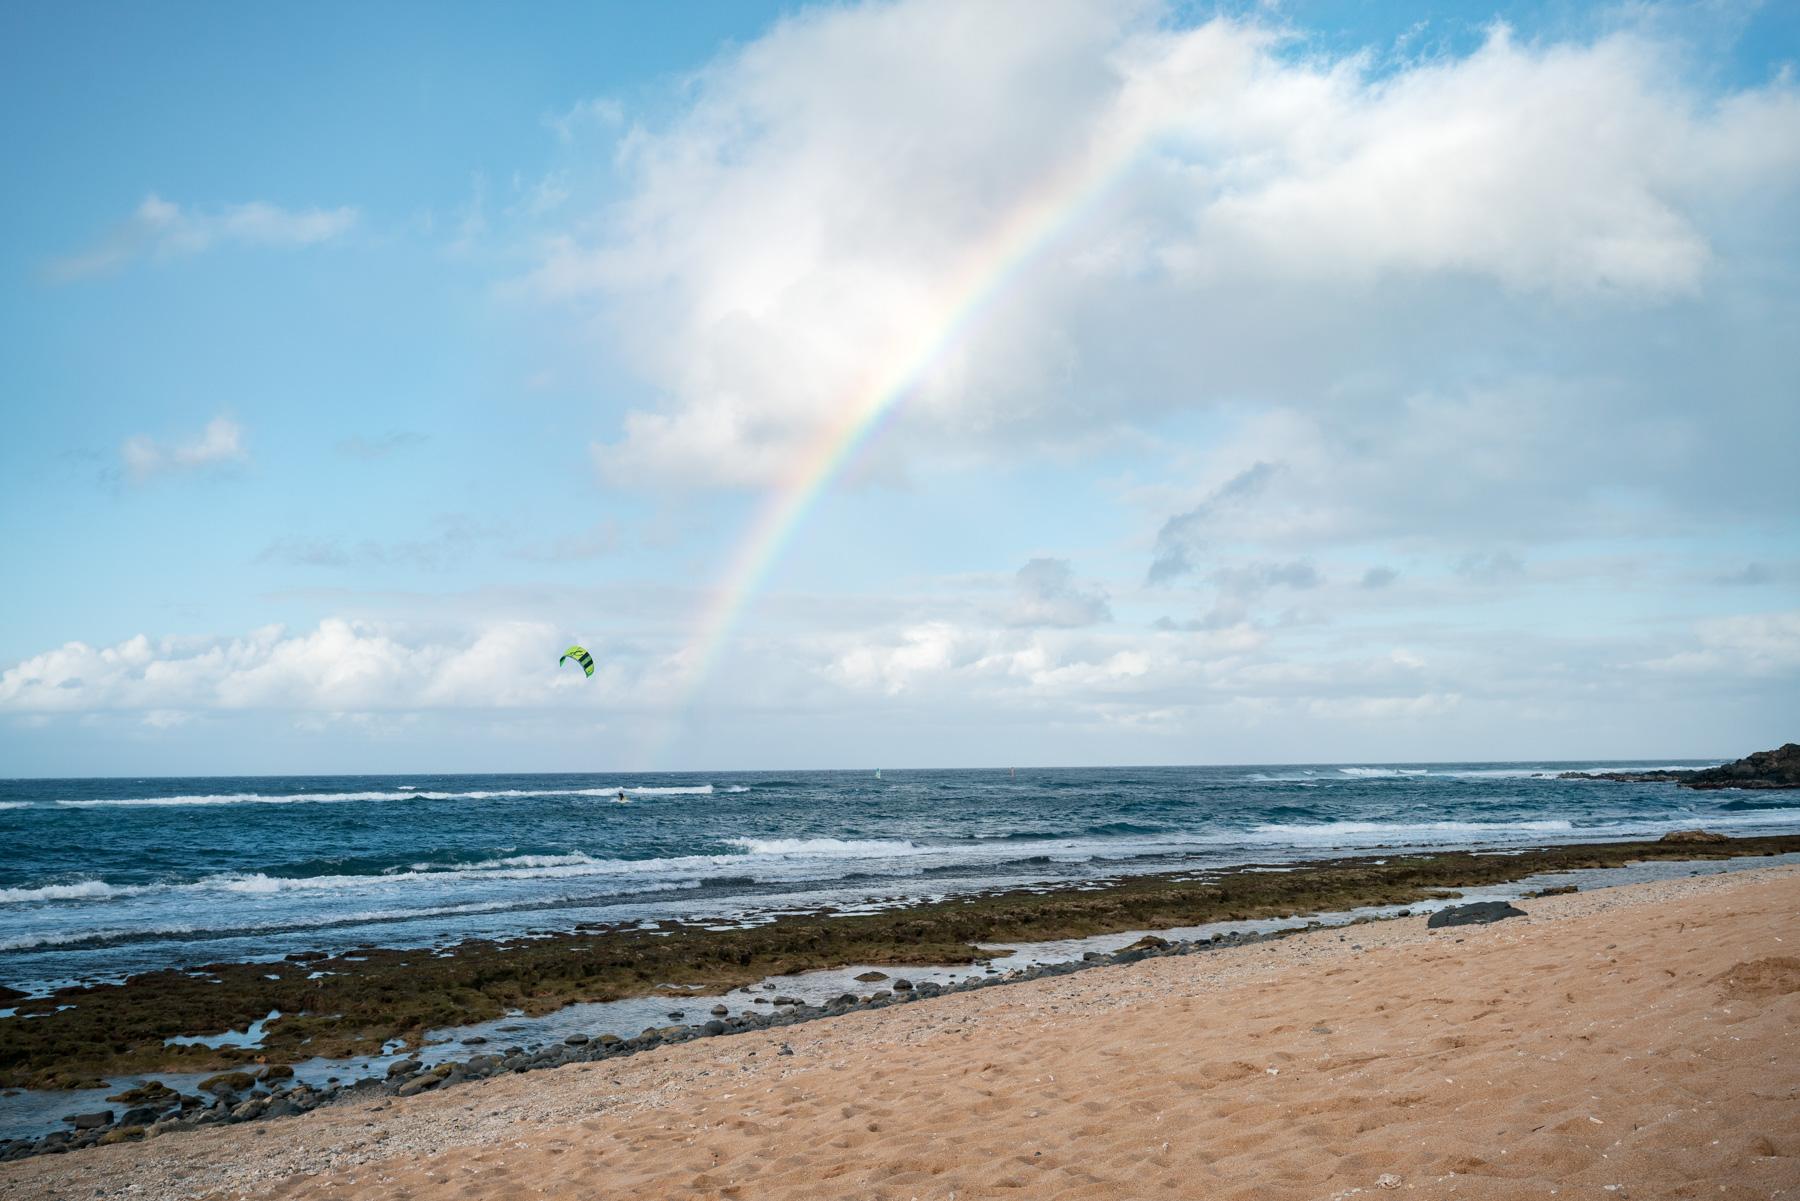 Maui-Trip-Kite-27.jpg